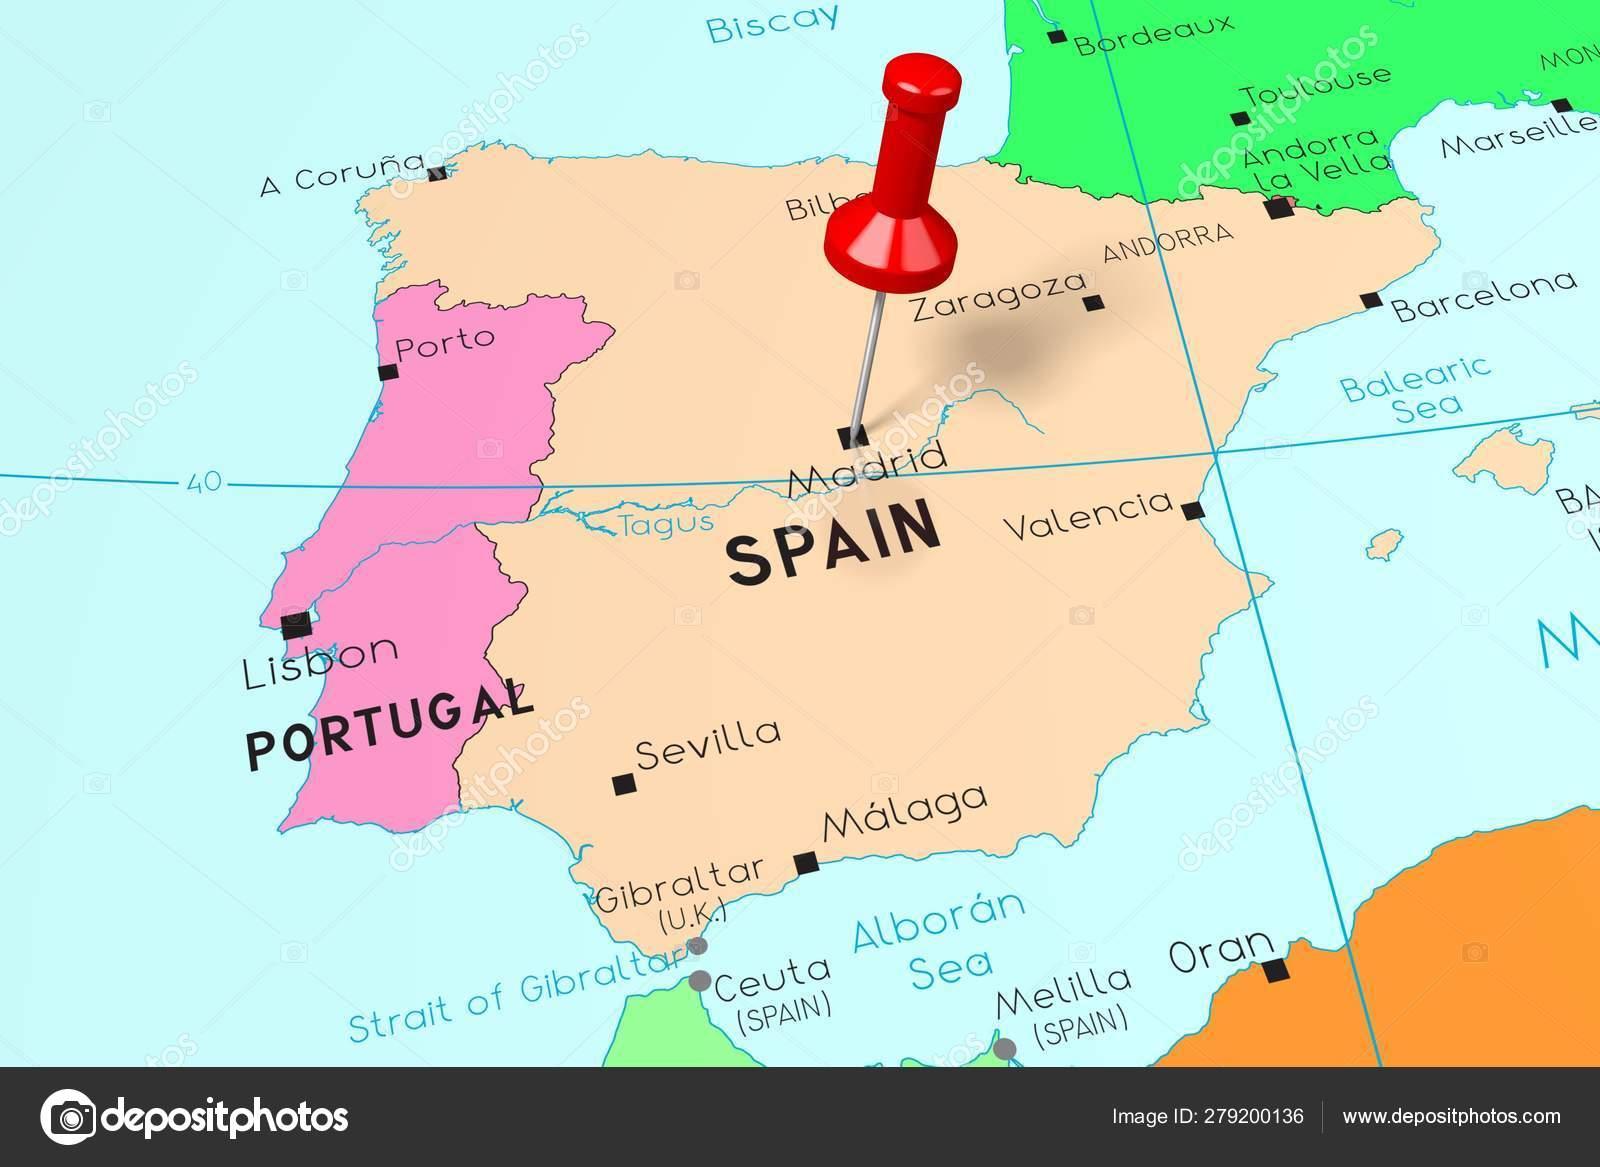 Madrid Capital De España Mapa.Espana Madrid Capital Anclada En El Mapa Politico Foto